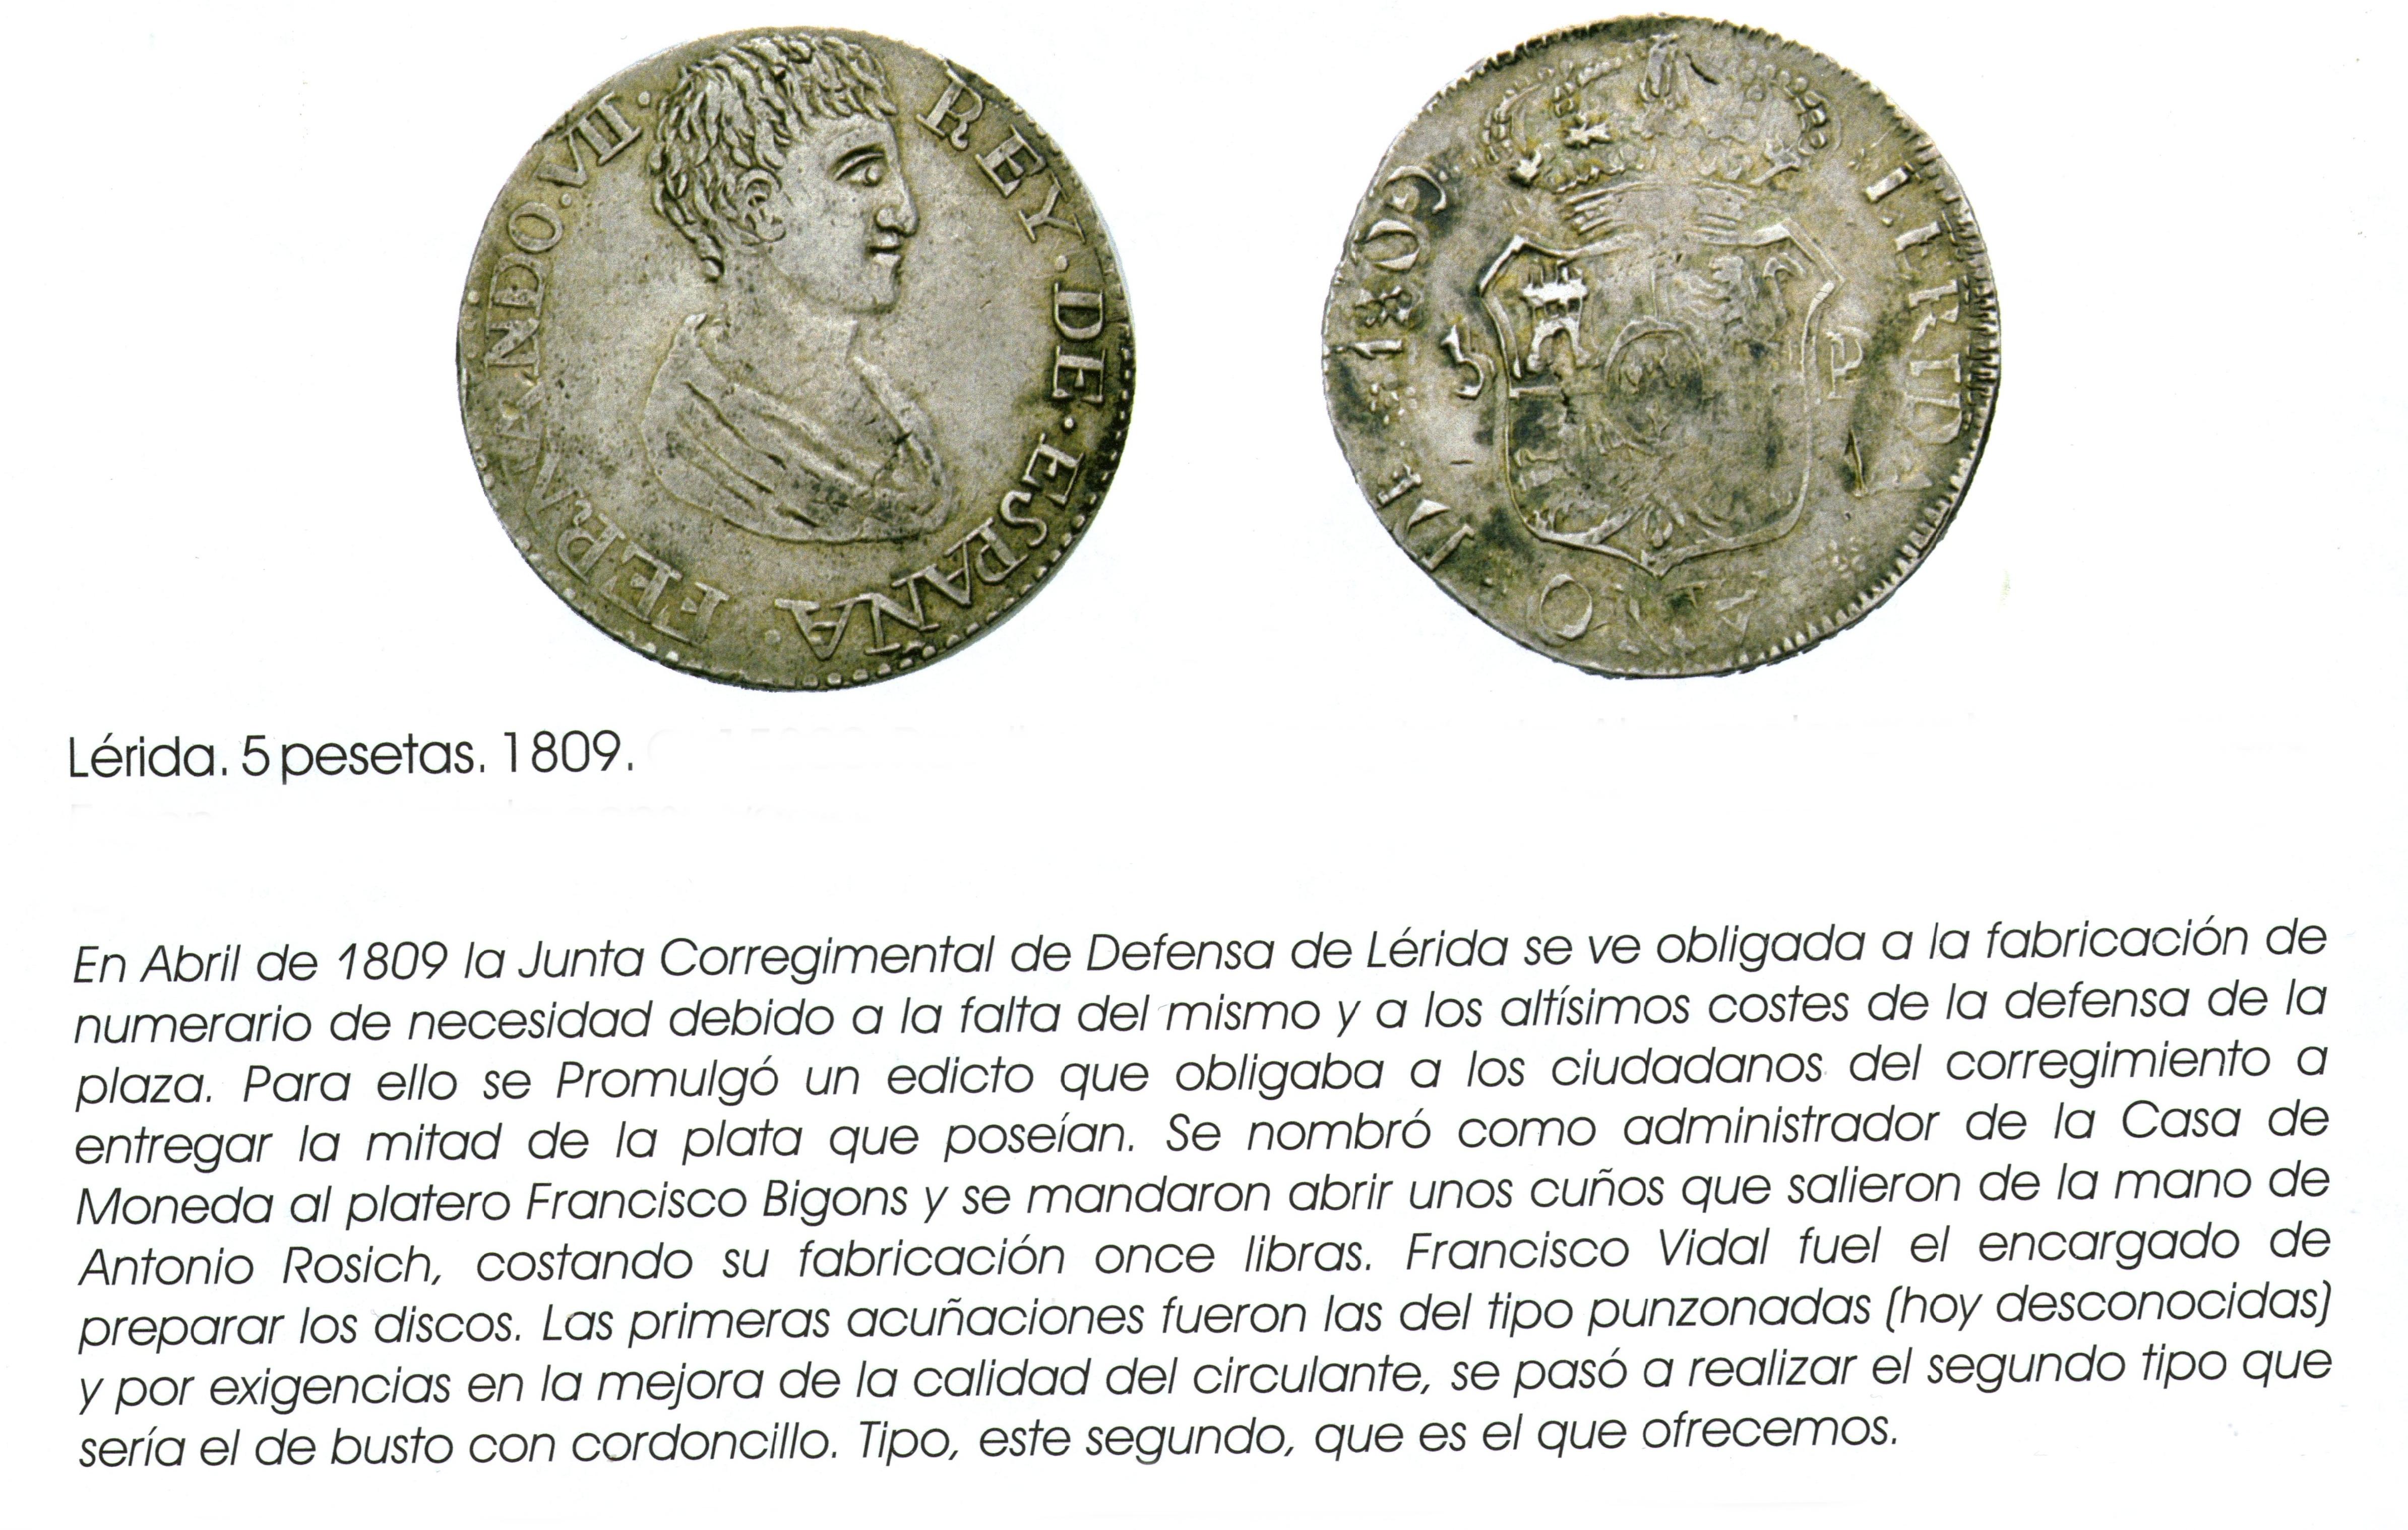 LERIDA 1809  FERNANDO VII. 5 PESETAS CAYON SUBASTAS. 11-12-2008. LOTE 2169